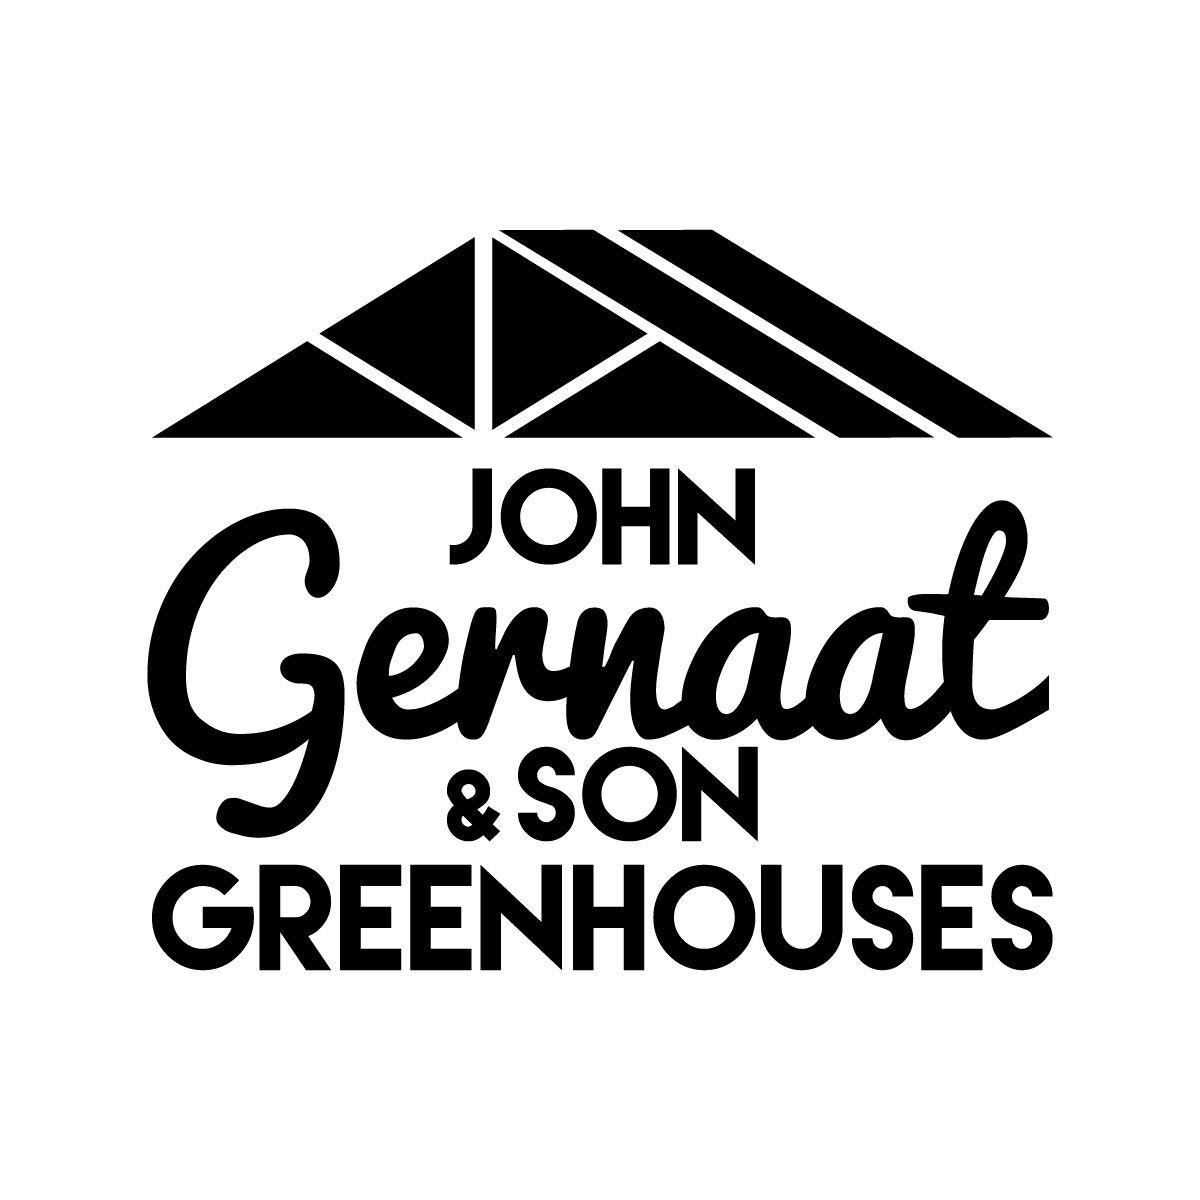 Gernaat & Son Greenhouses